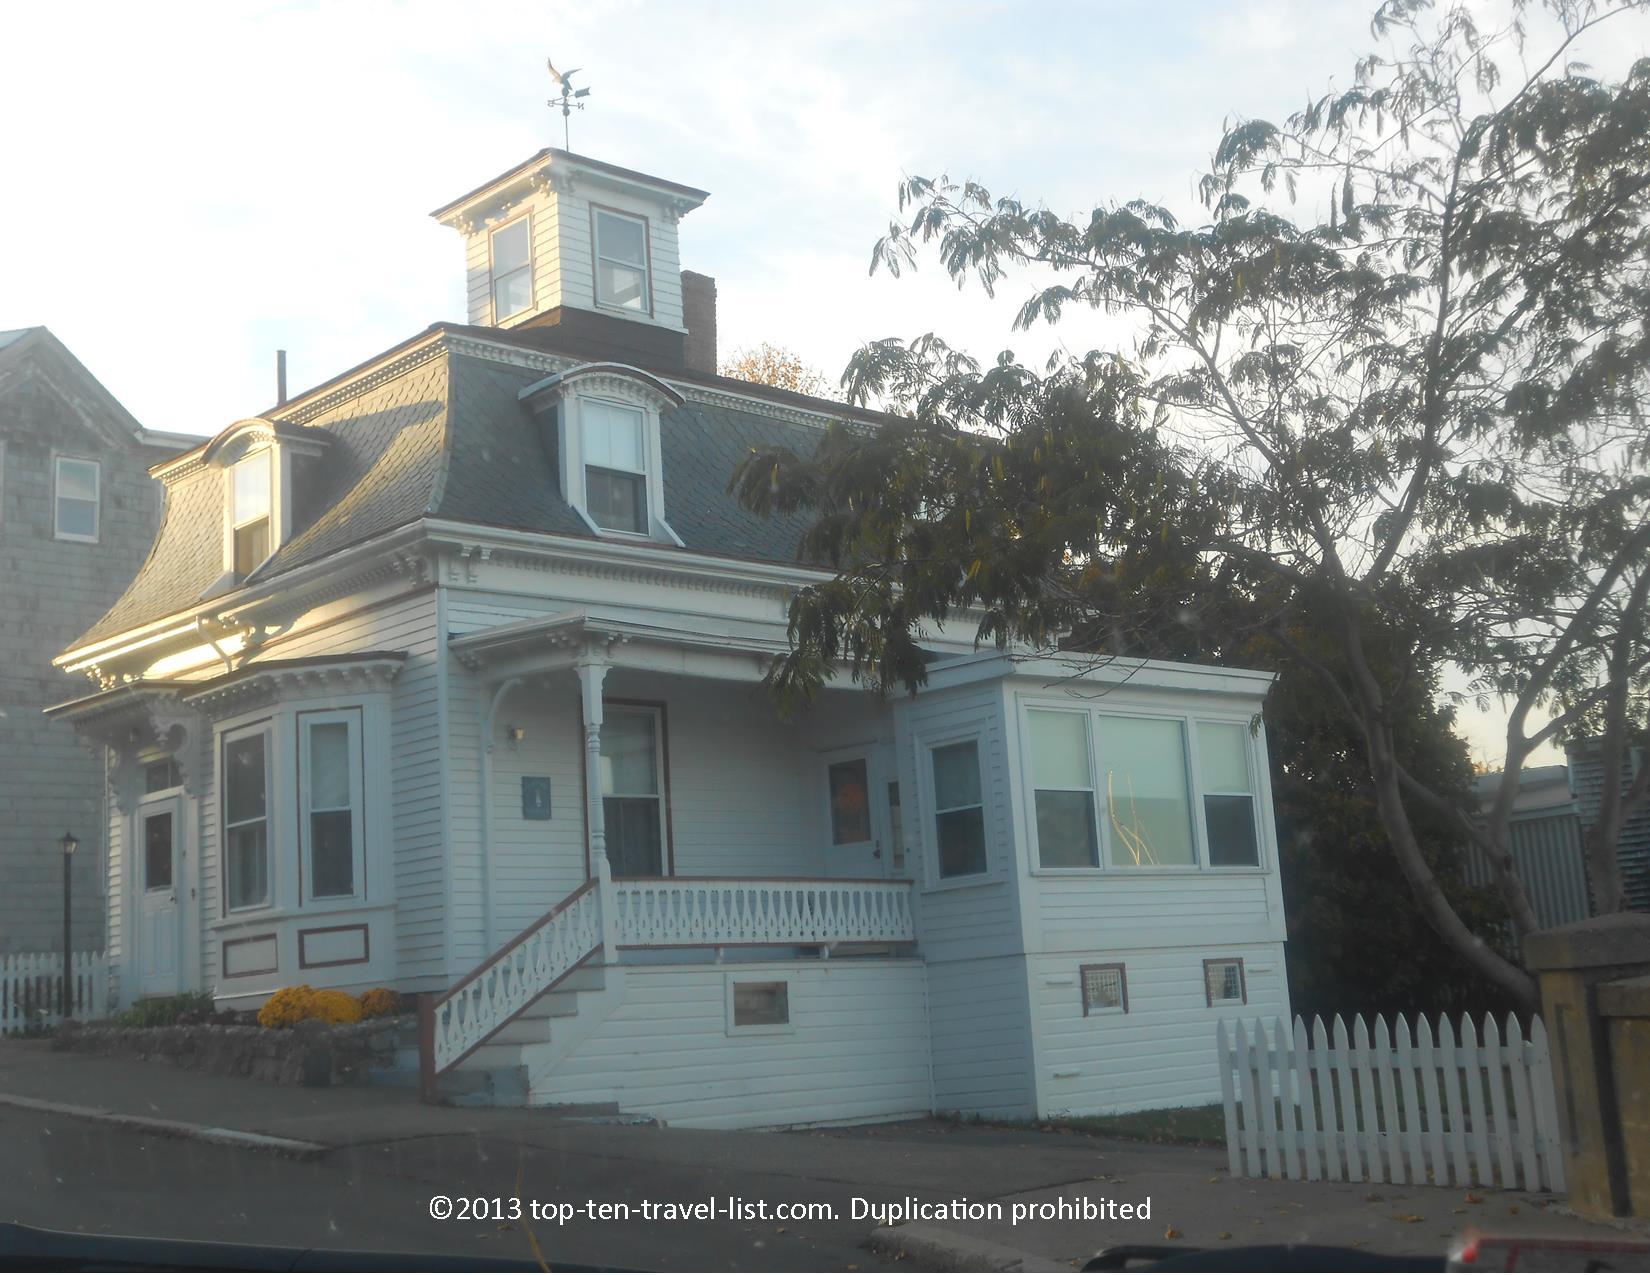 Max and Dani's house from Hocus Pocus, filmed in Salem, Massachusetts